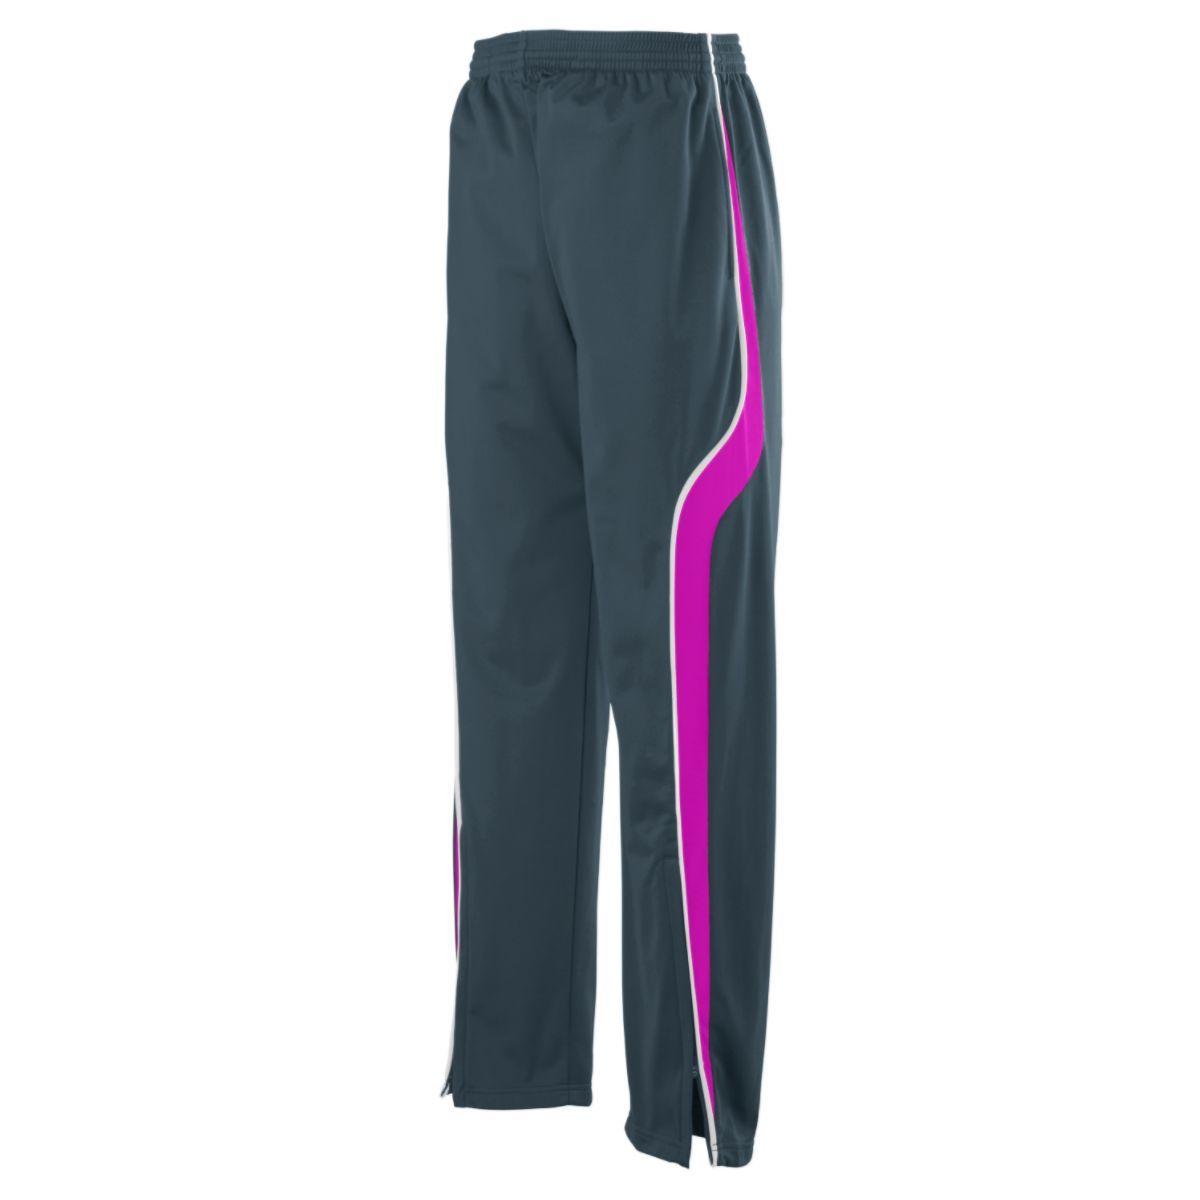 Rival Pant - SLATE/POWER PINK/WHITE